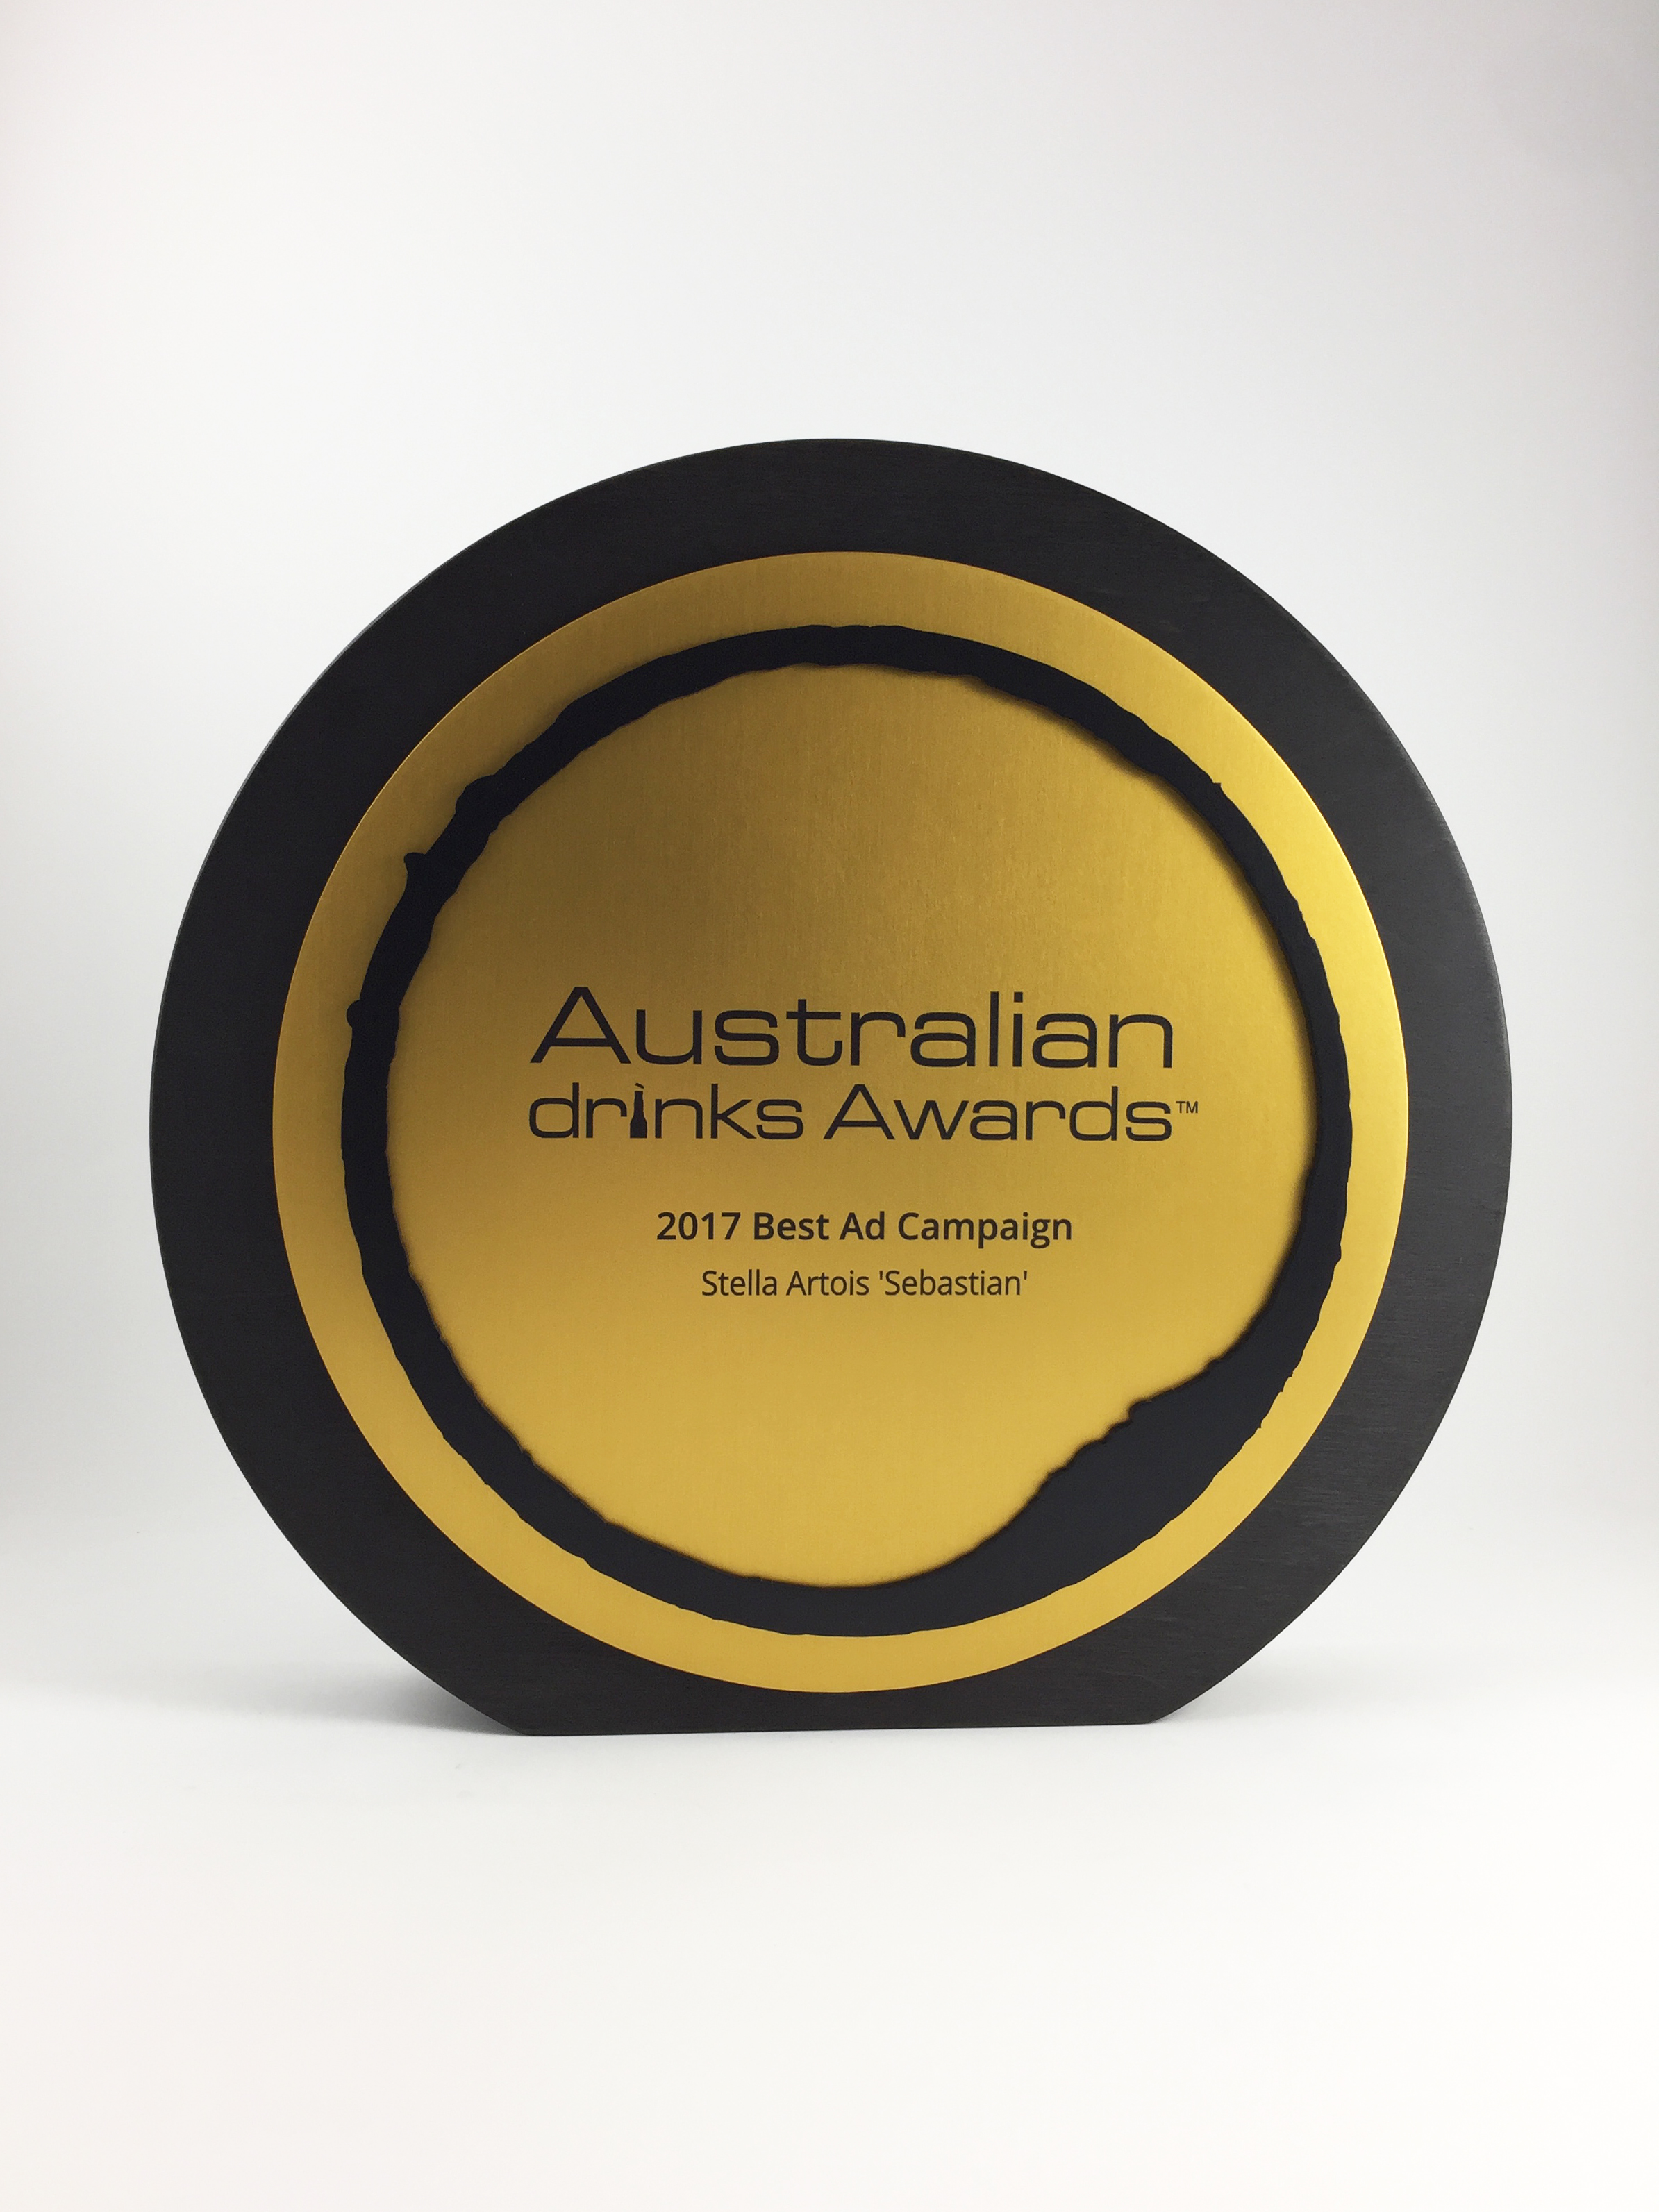 australian-drinks-awards-eco-timber-plywood-metal-trophy-01.jpg